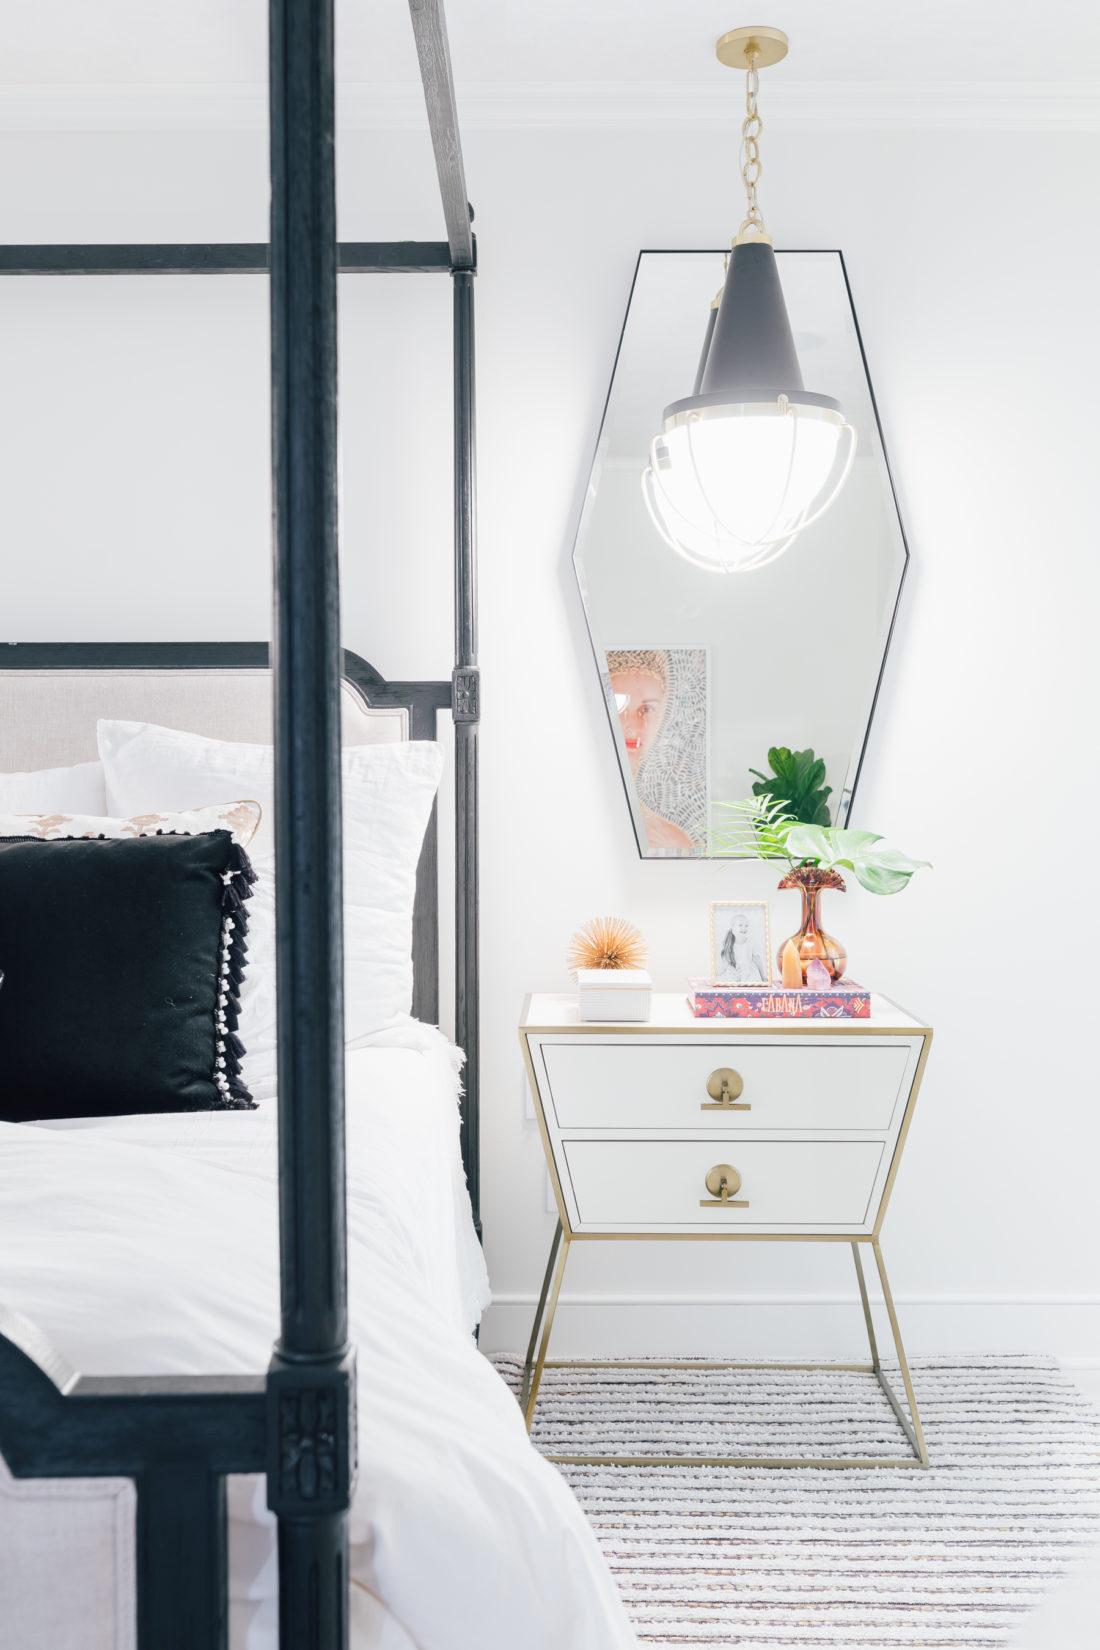 The side tables inside Eva Amurri Martino's new master bedroom